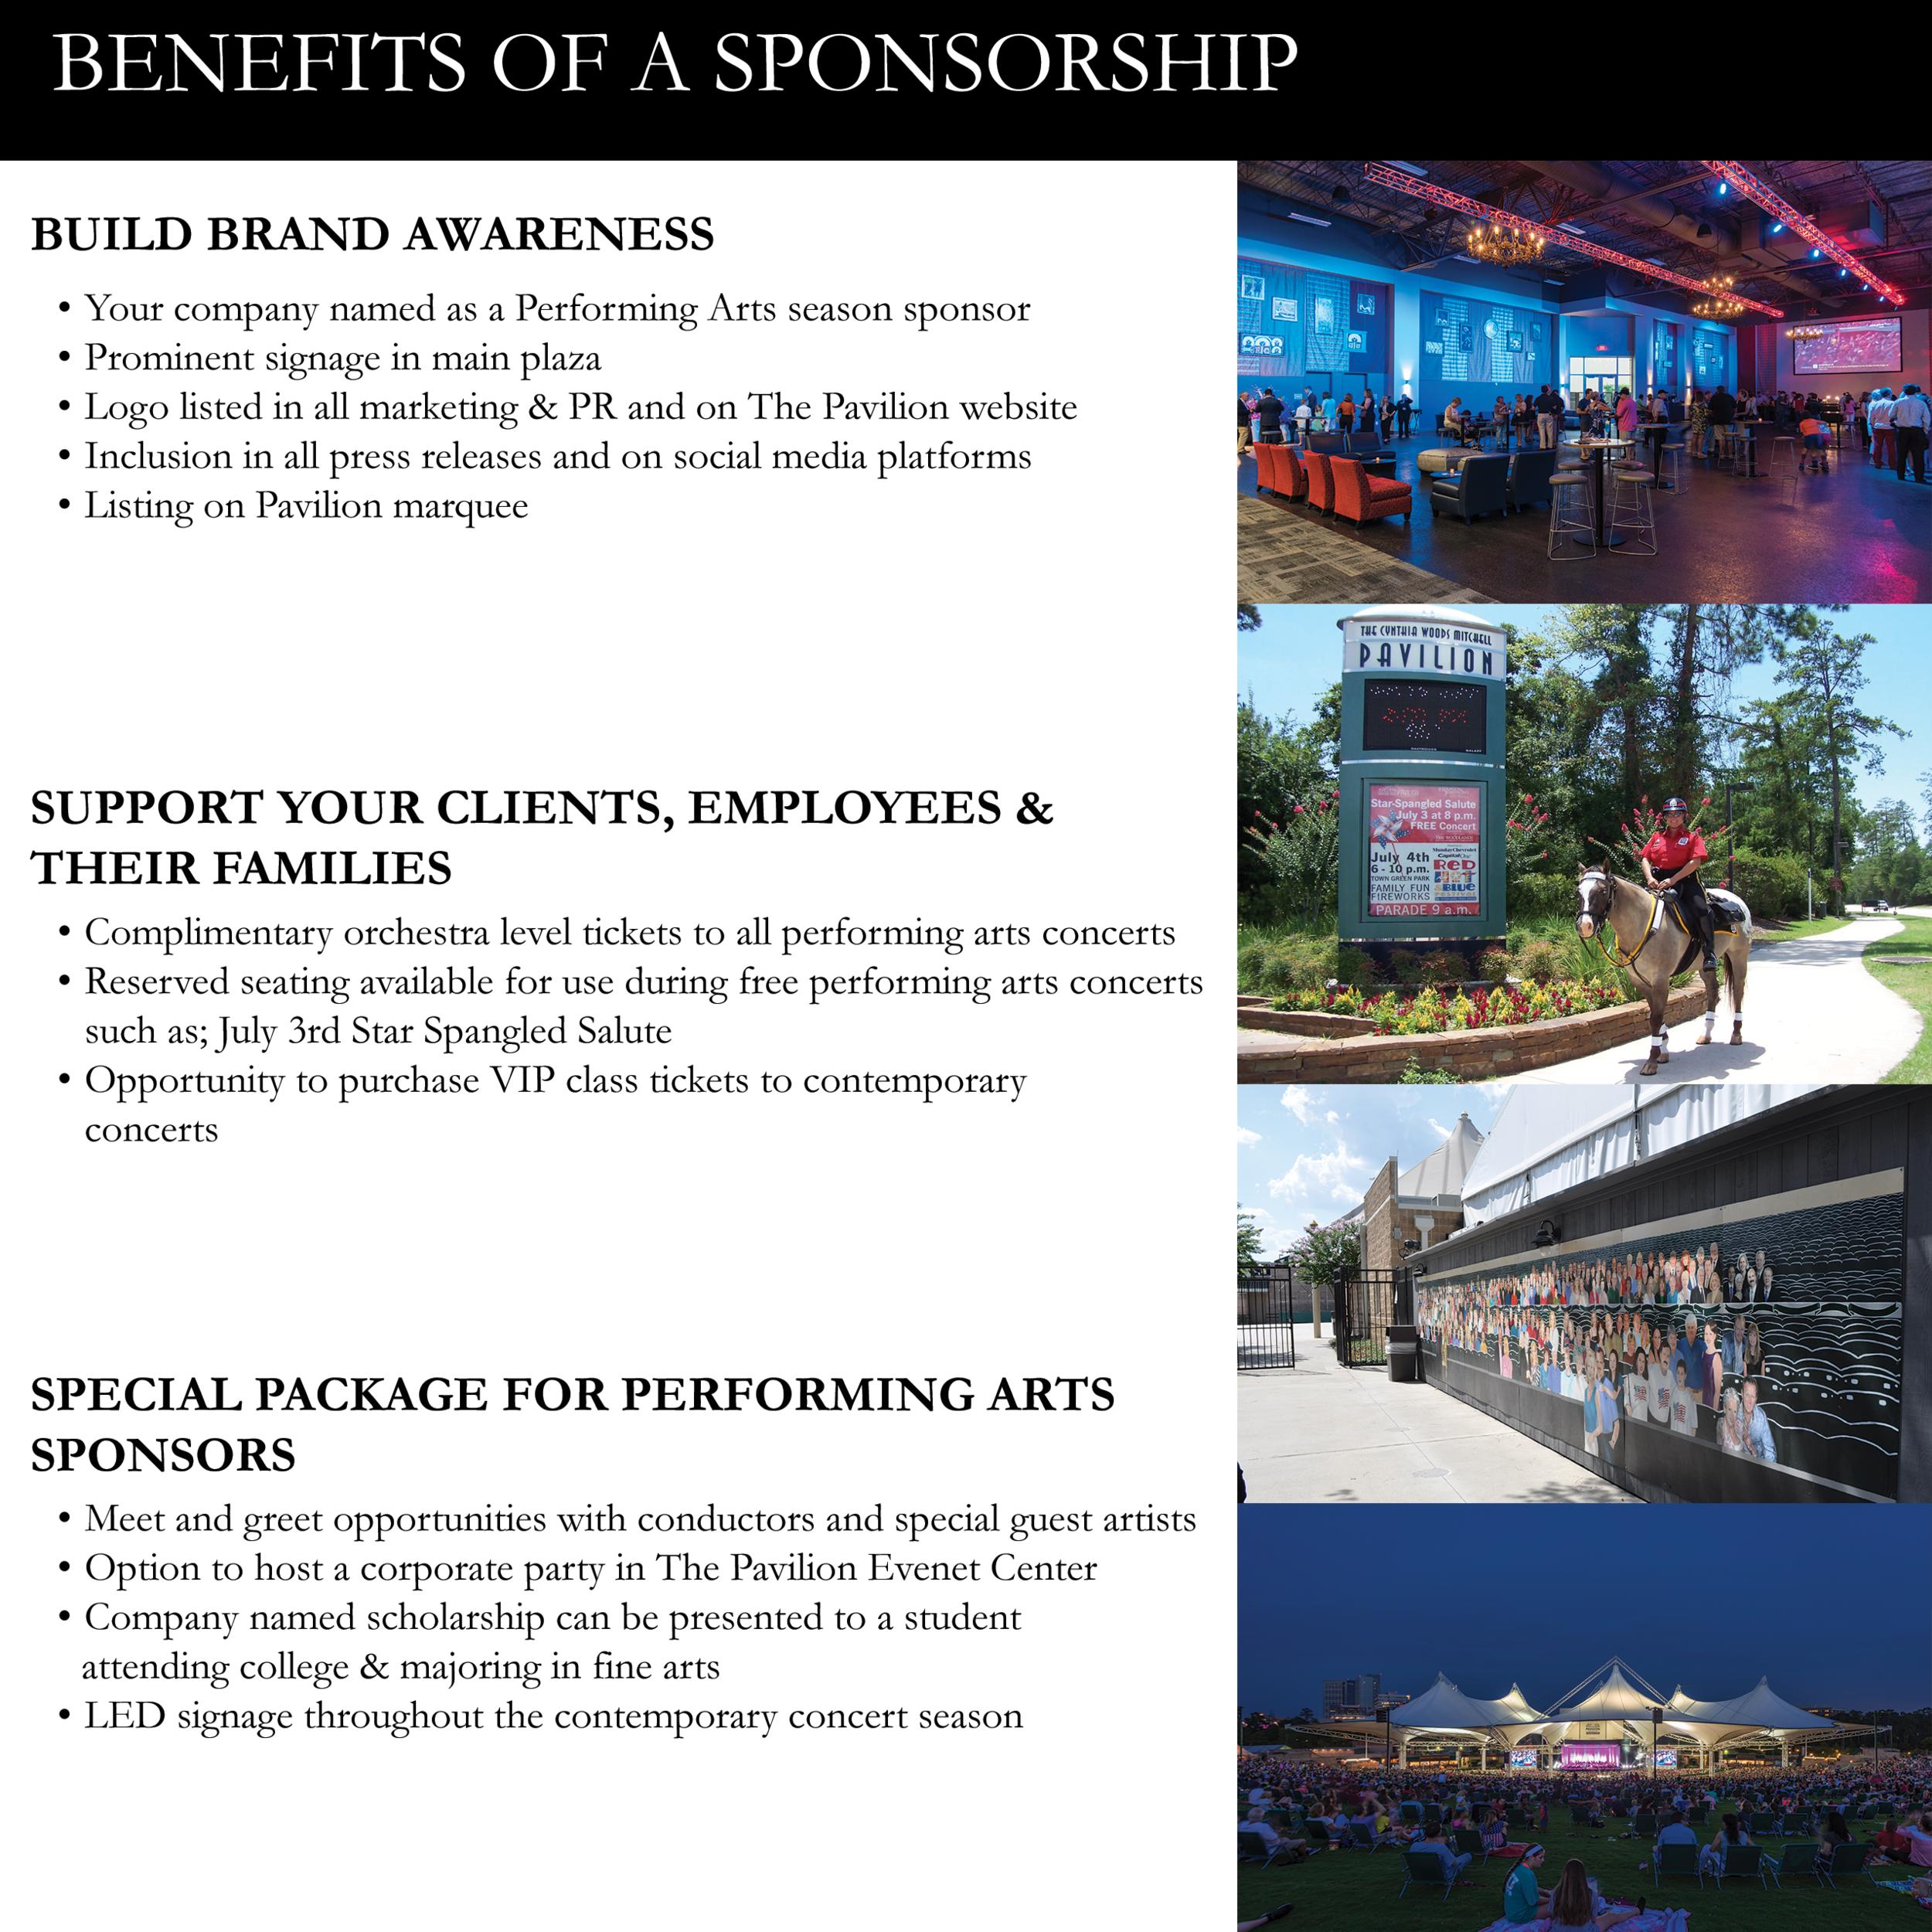 Benefits of Sponsorship 7.png